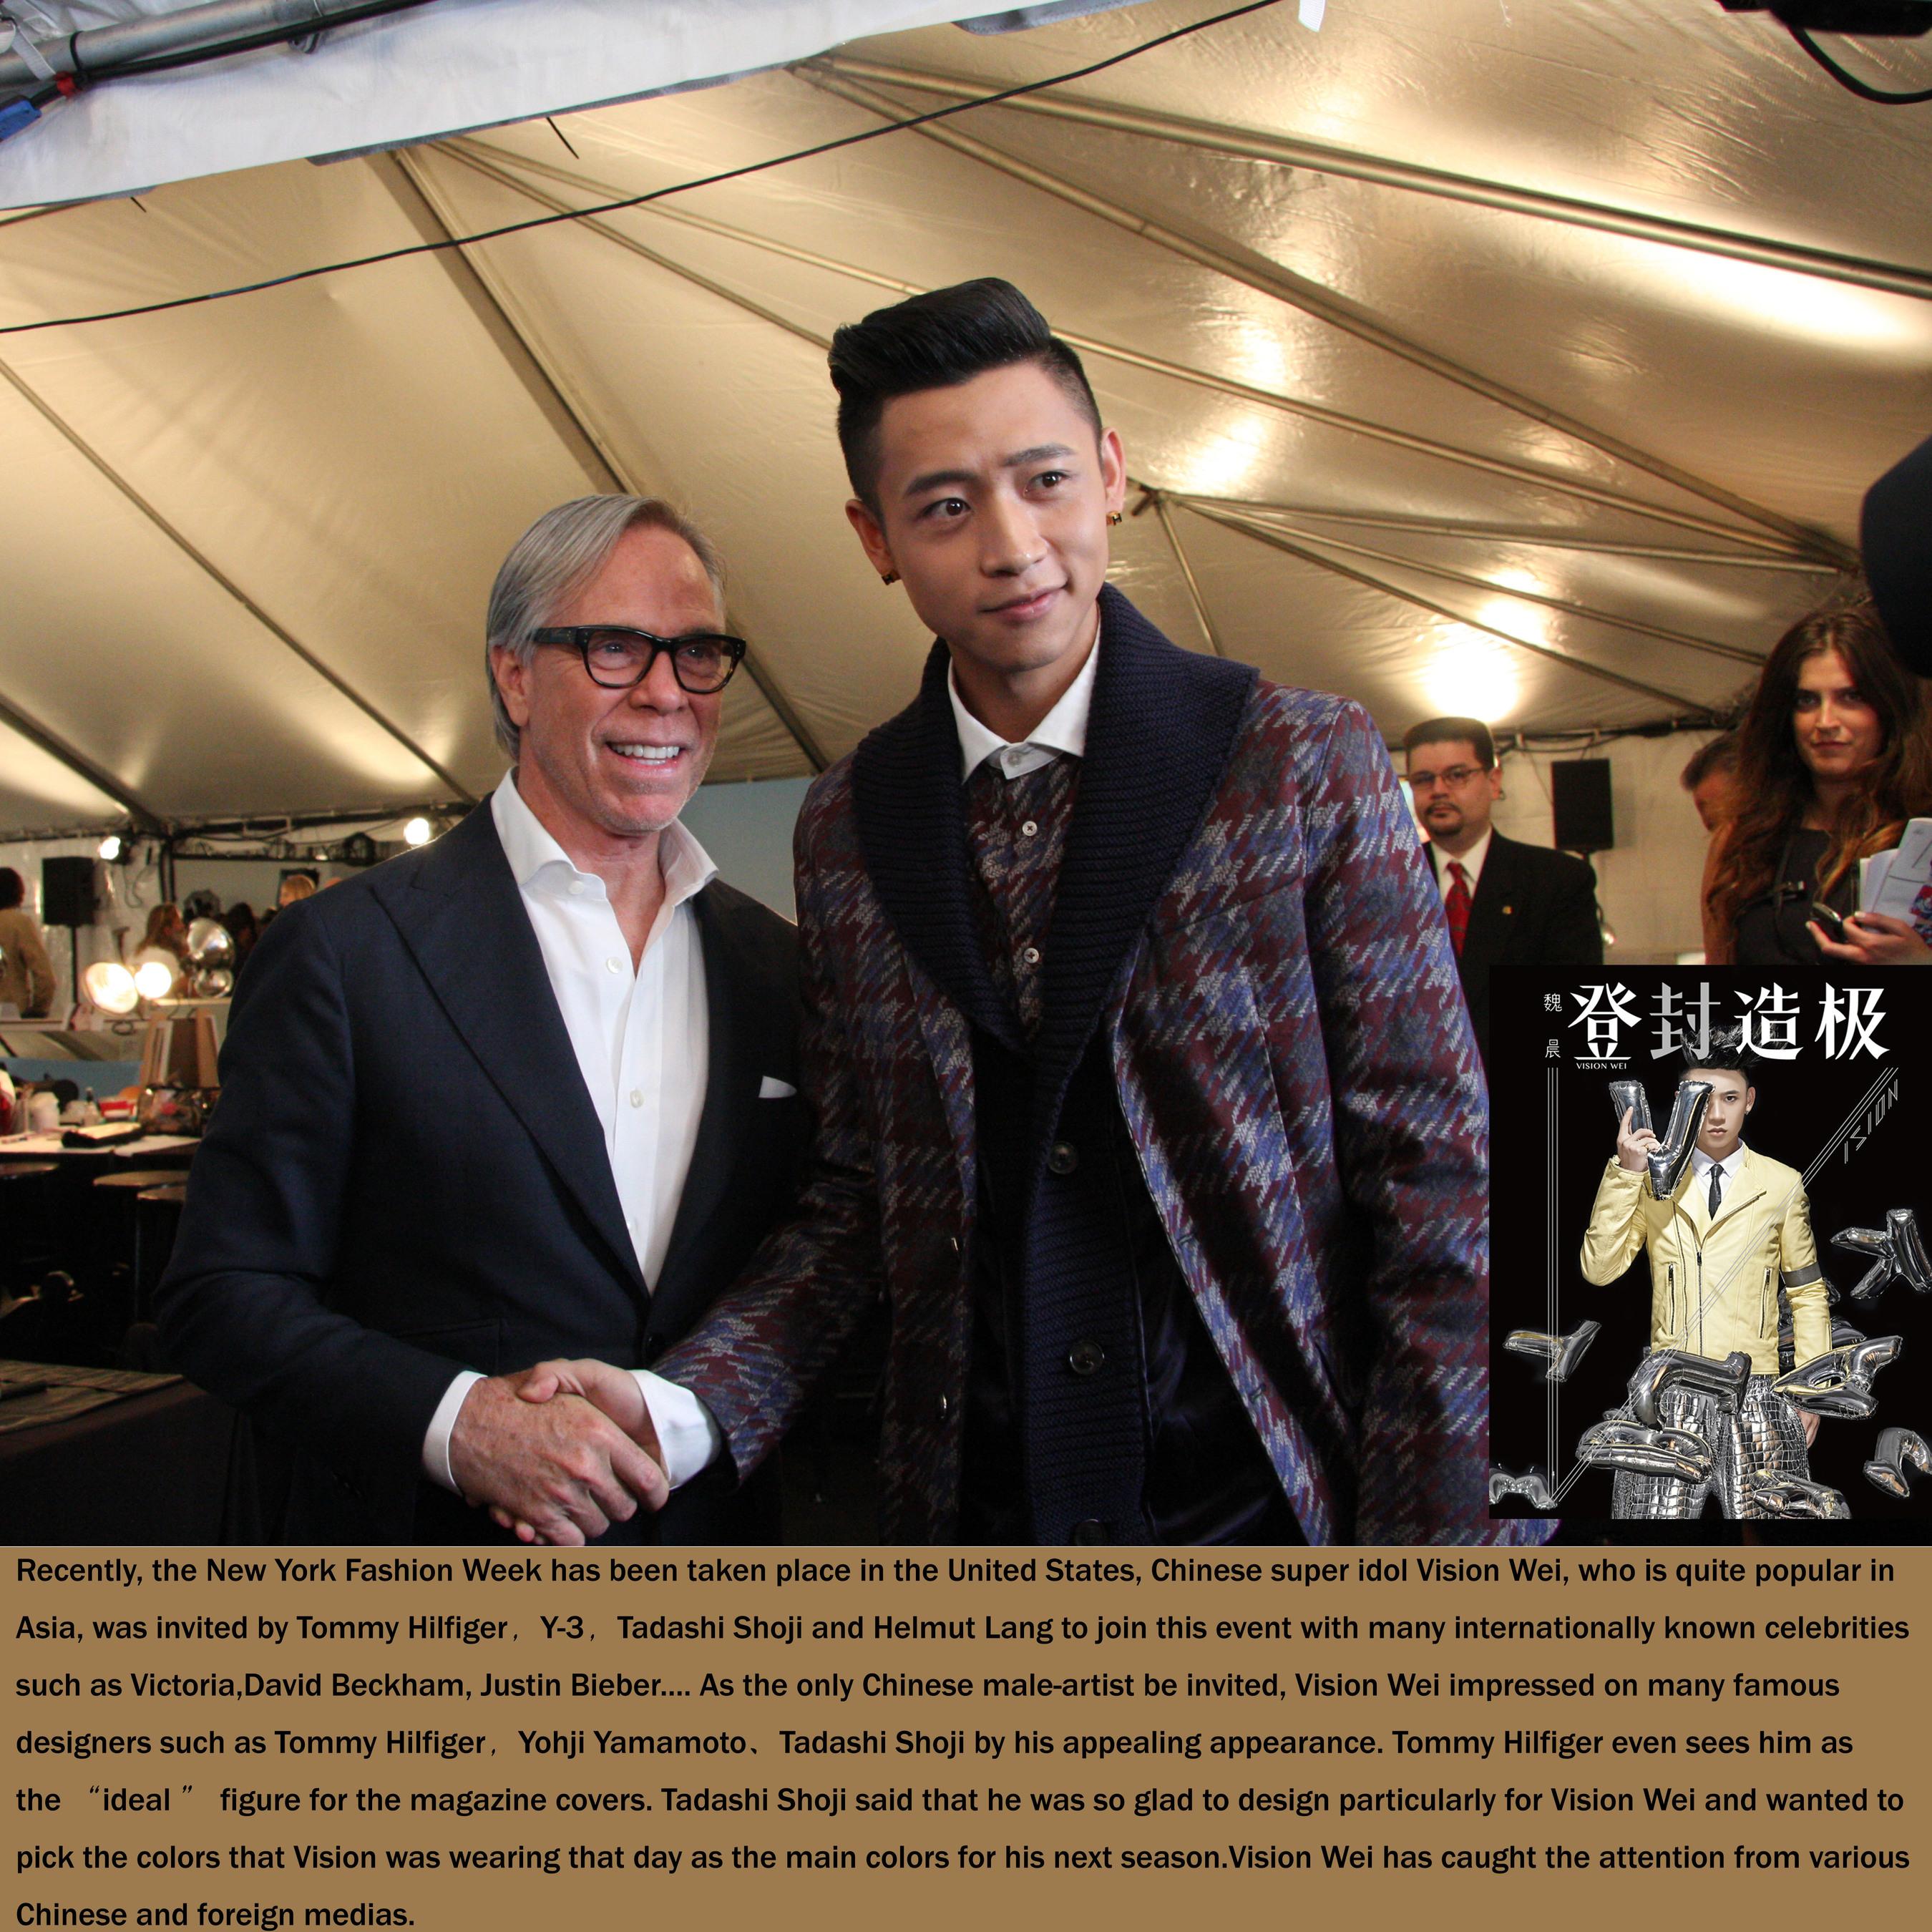 Chinese Super Idol Vision Wei Invited to Join New York Fashion Week Spring/Summer 2014. (PRNewsFoto/EE-Media) (PRNewsFoto/EE-MEDIA)